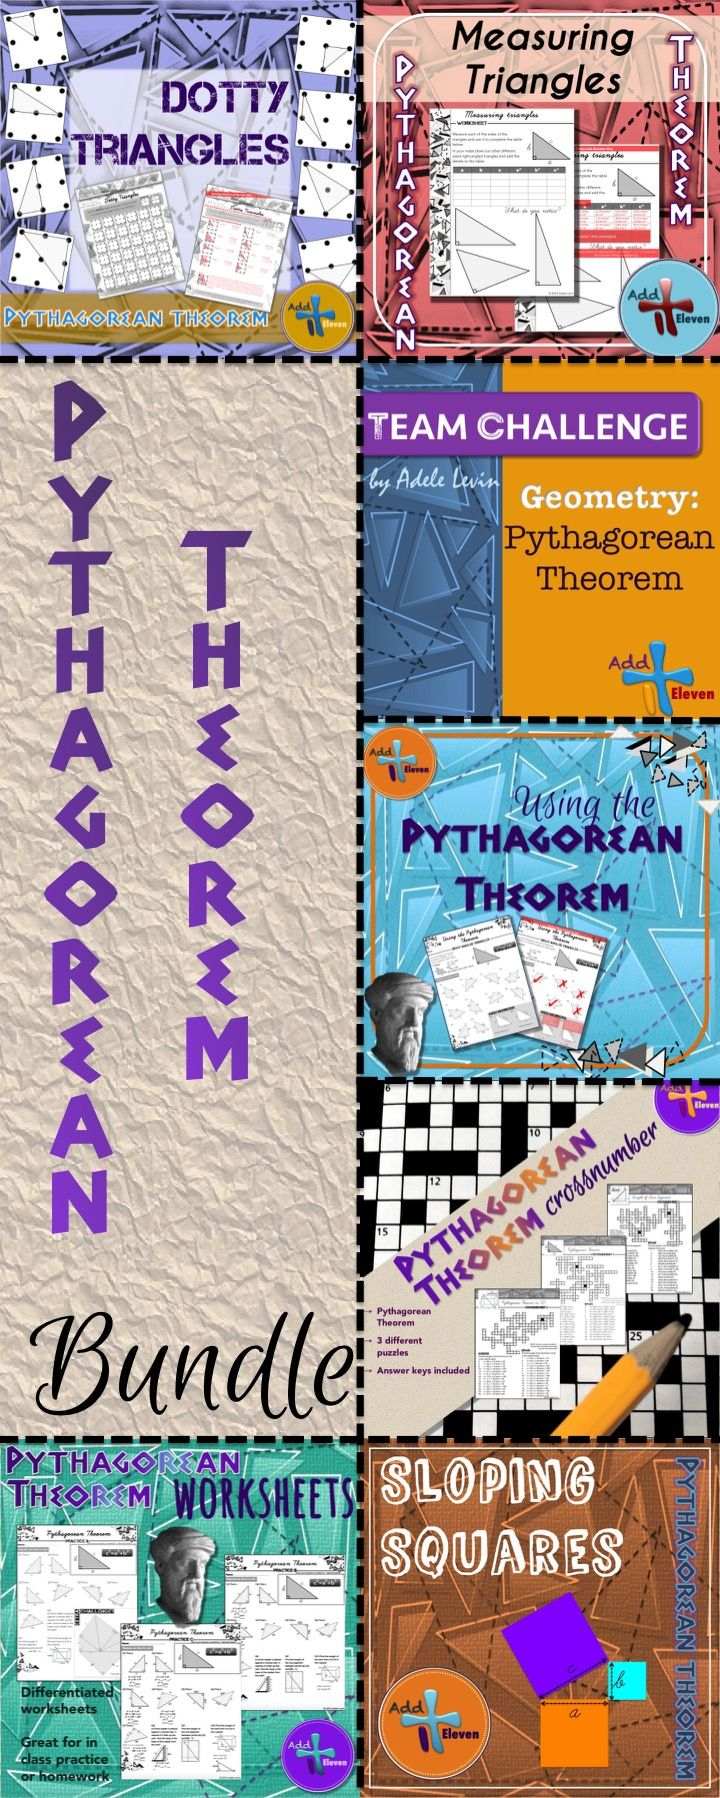 Bundle of Pythagorean Theorem tasks